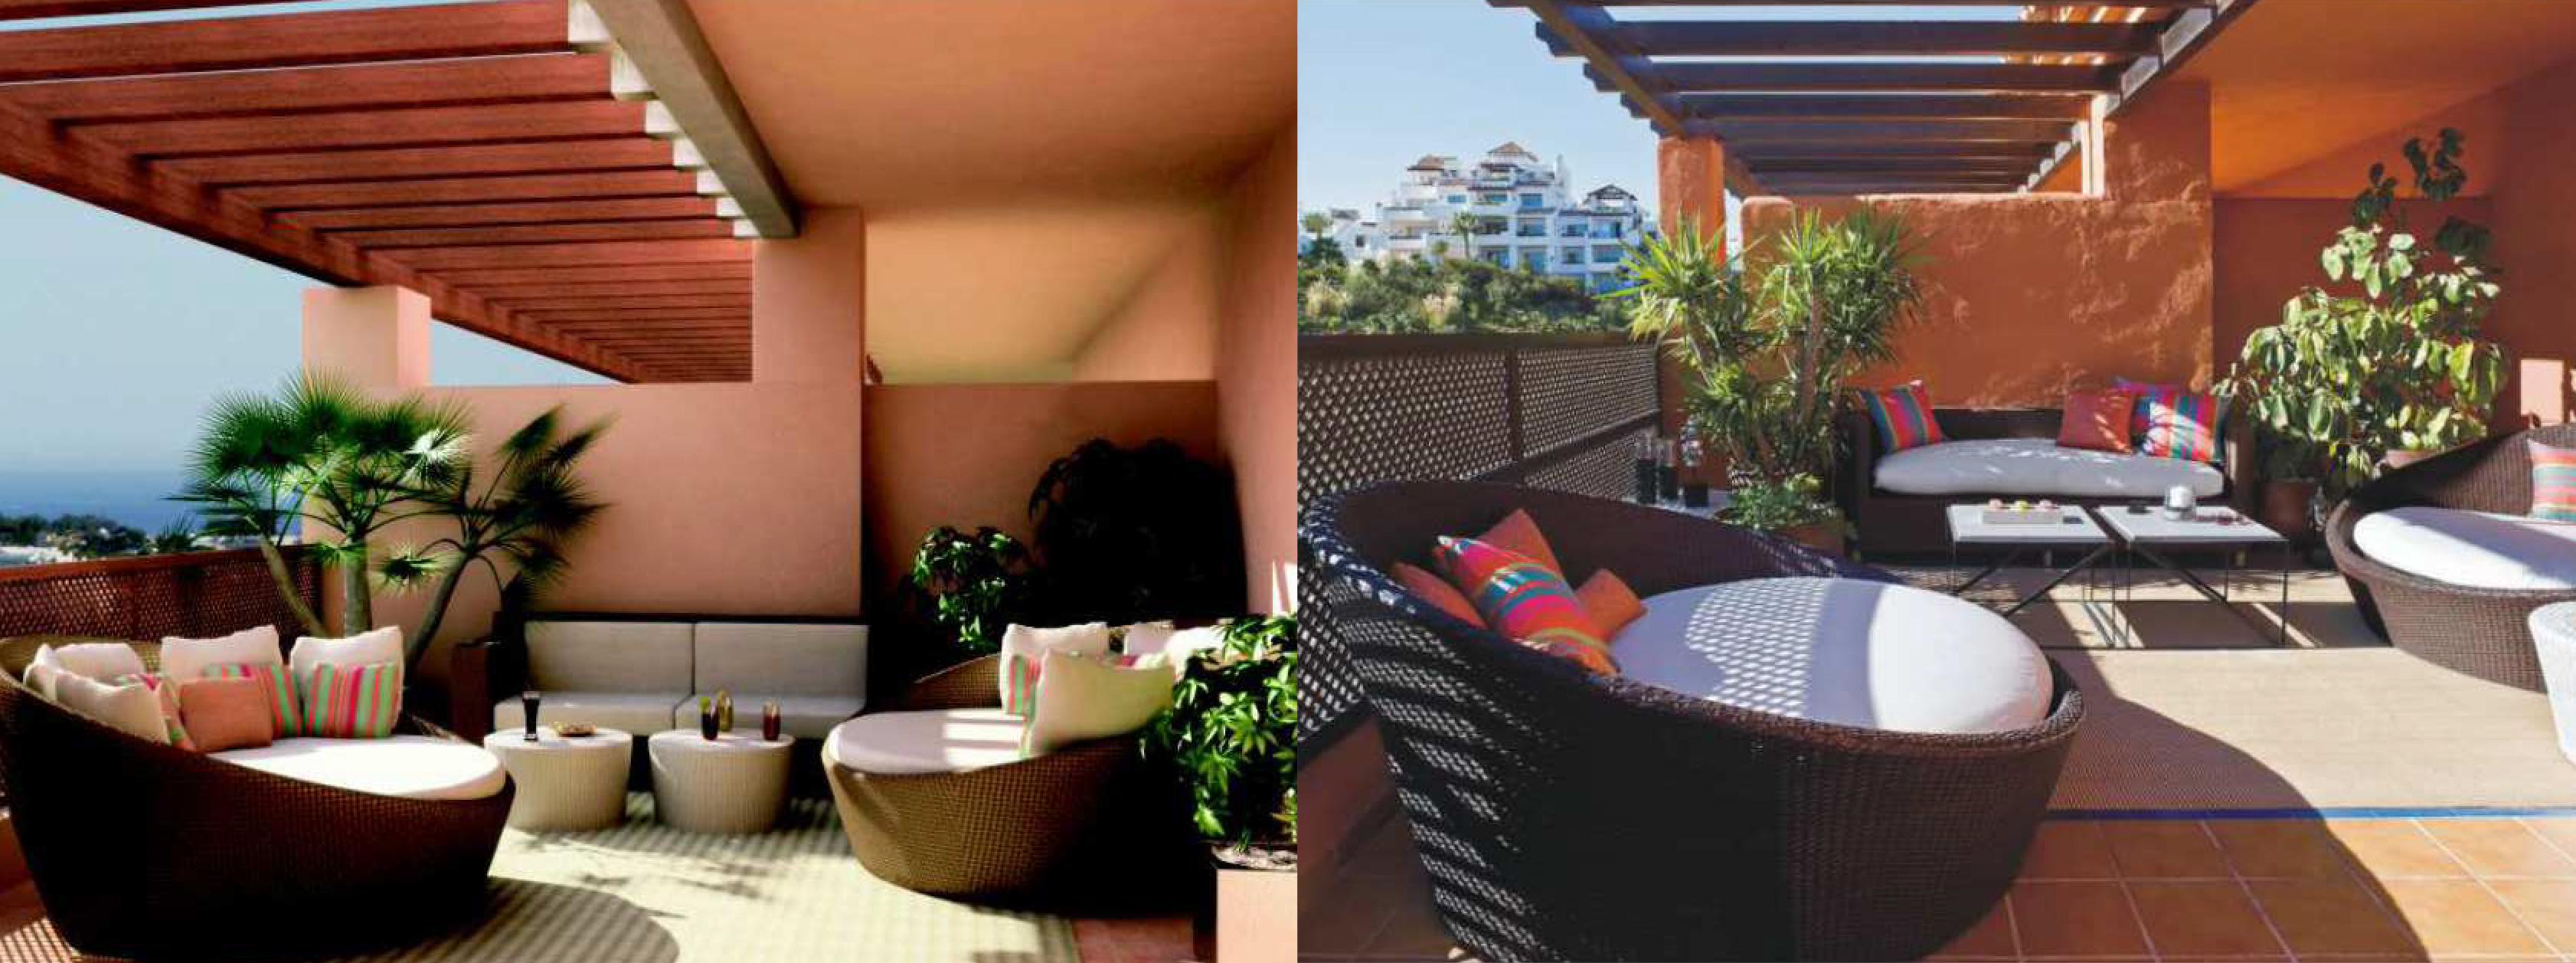 Diseño de interiores en terrazas